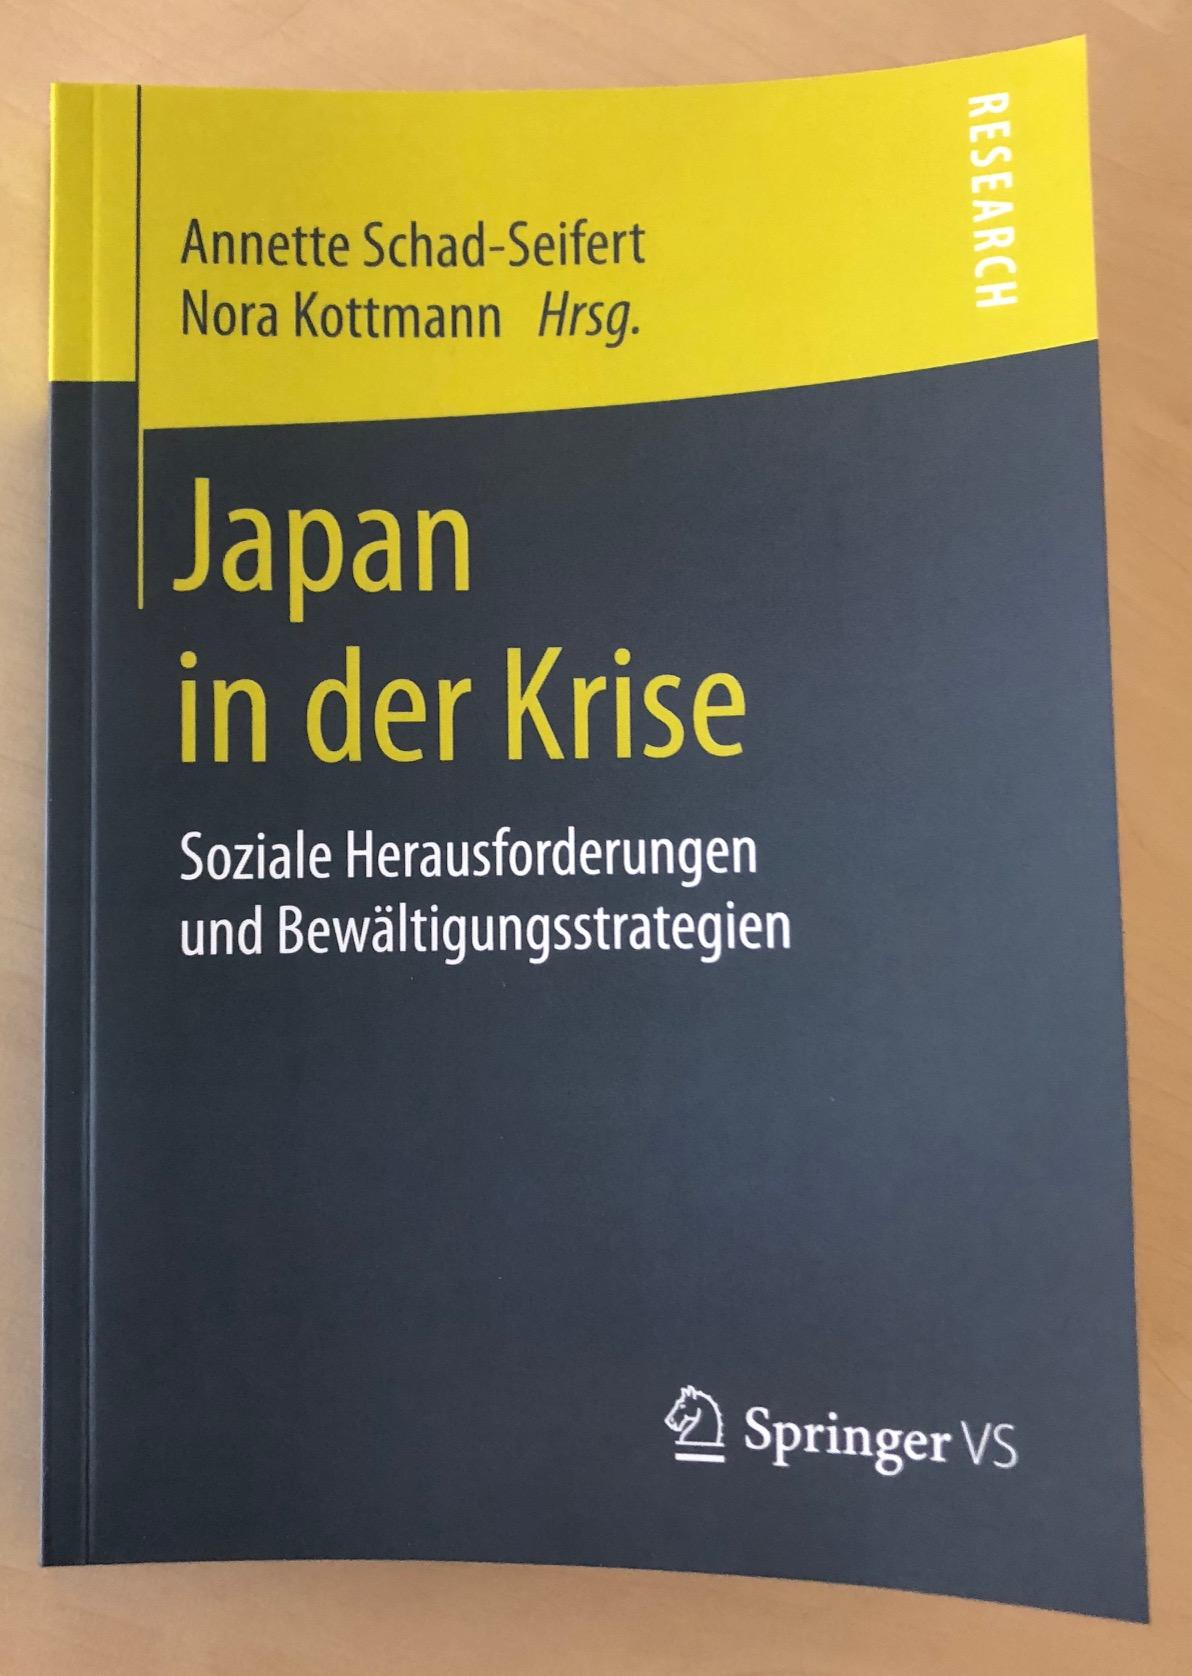 Japan in der Krise